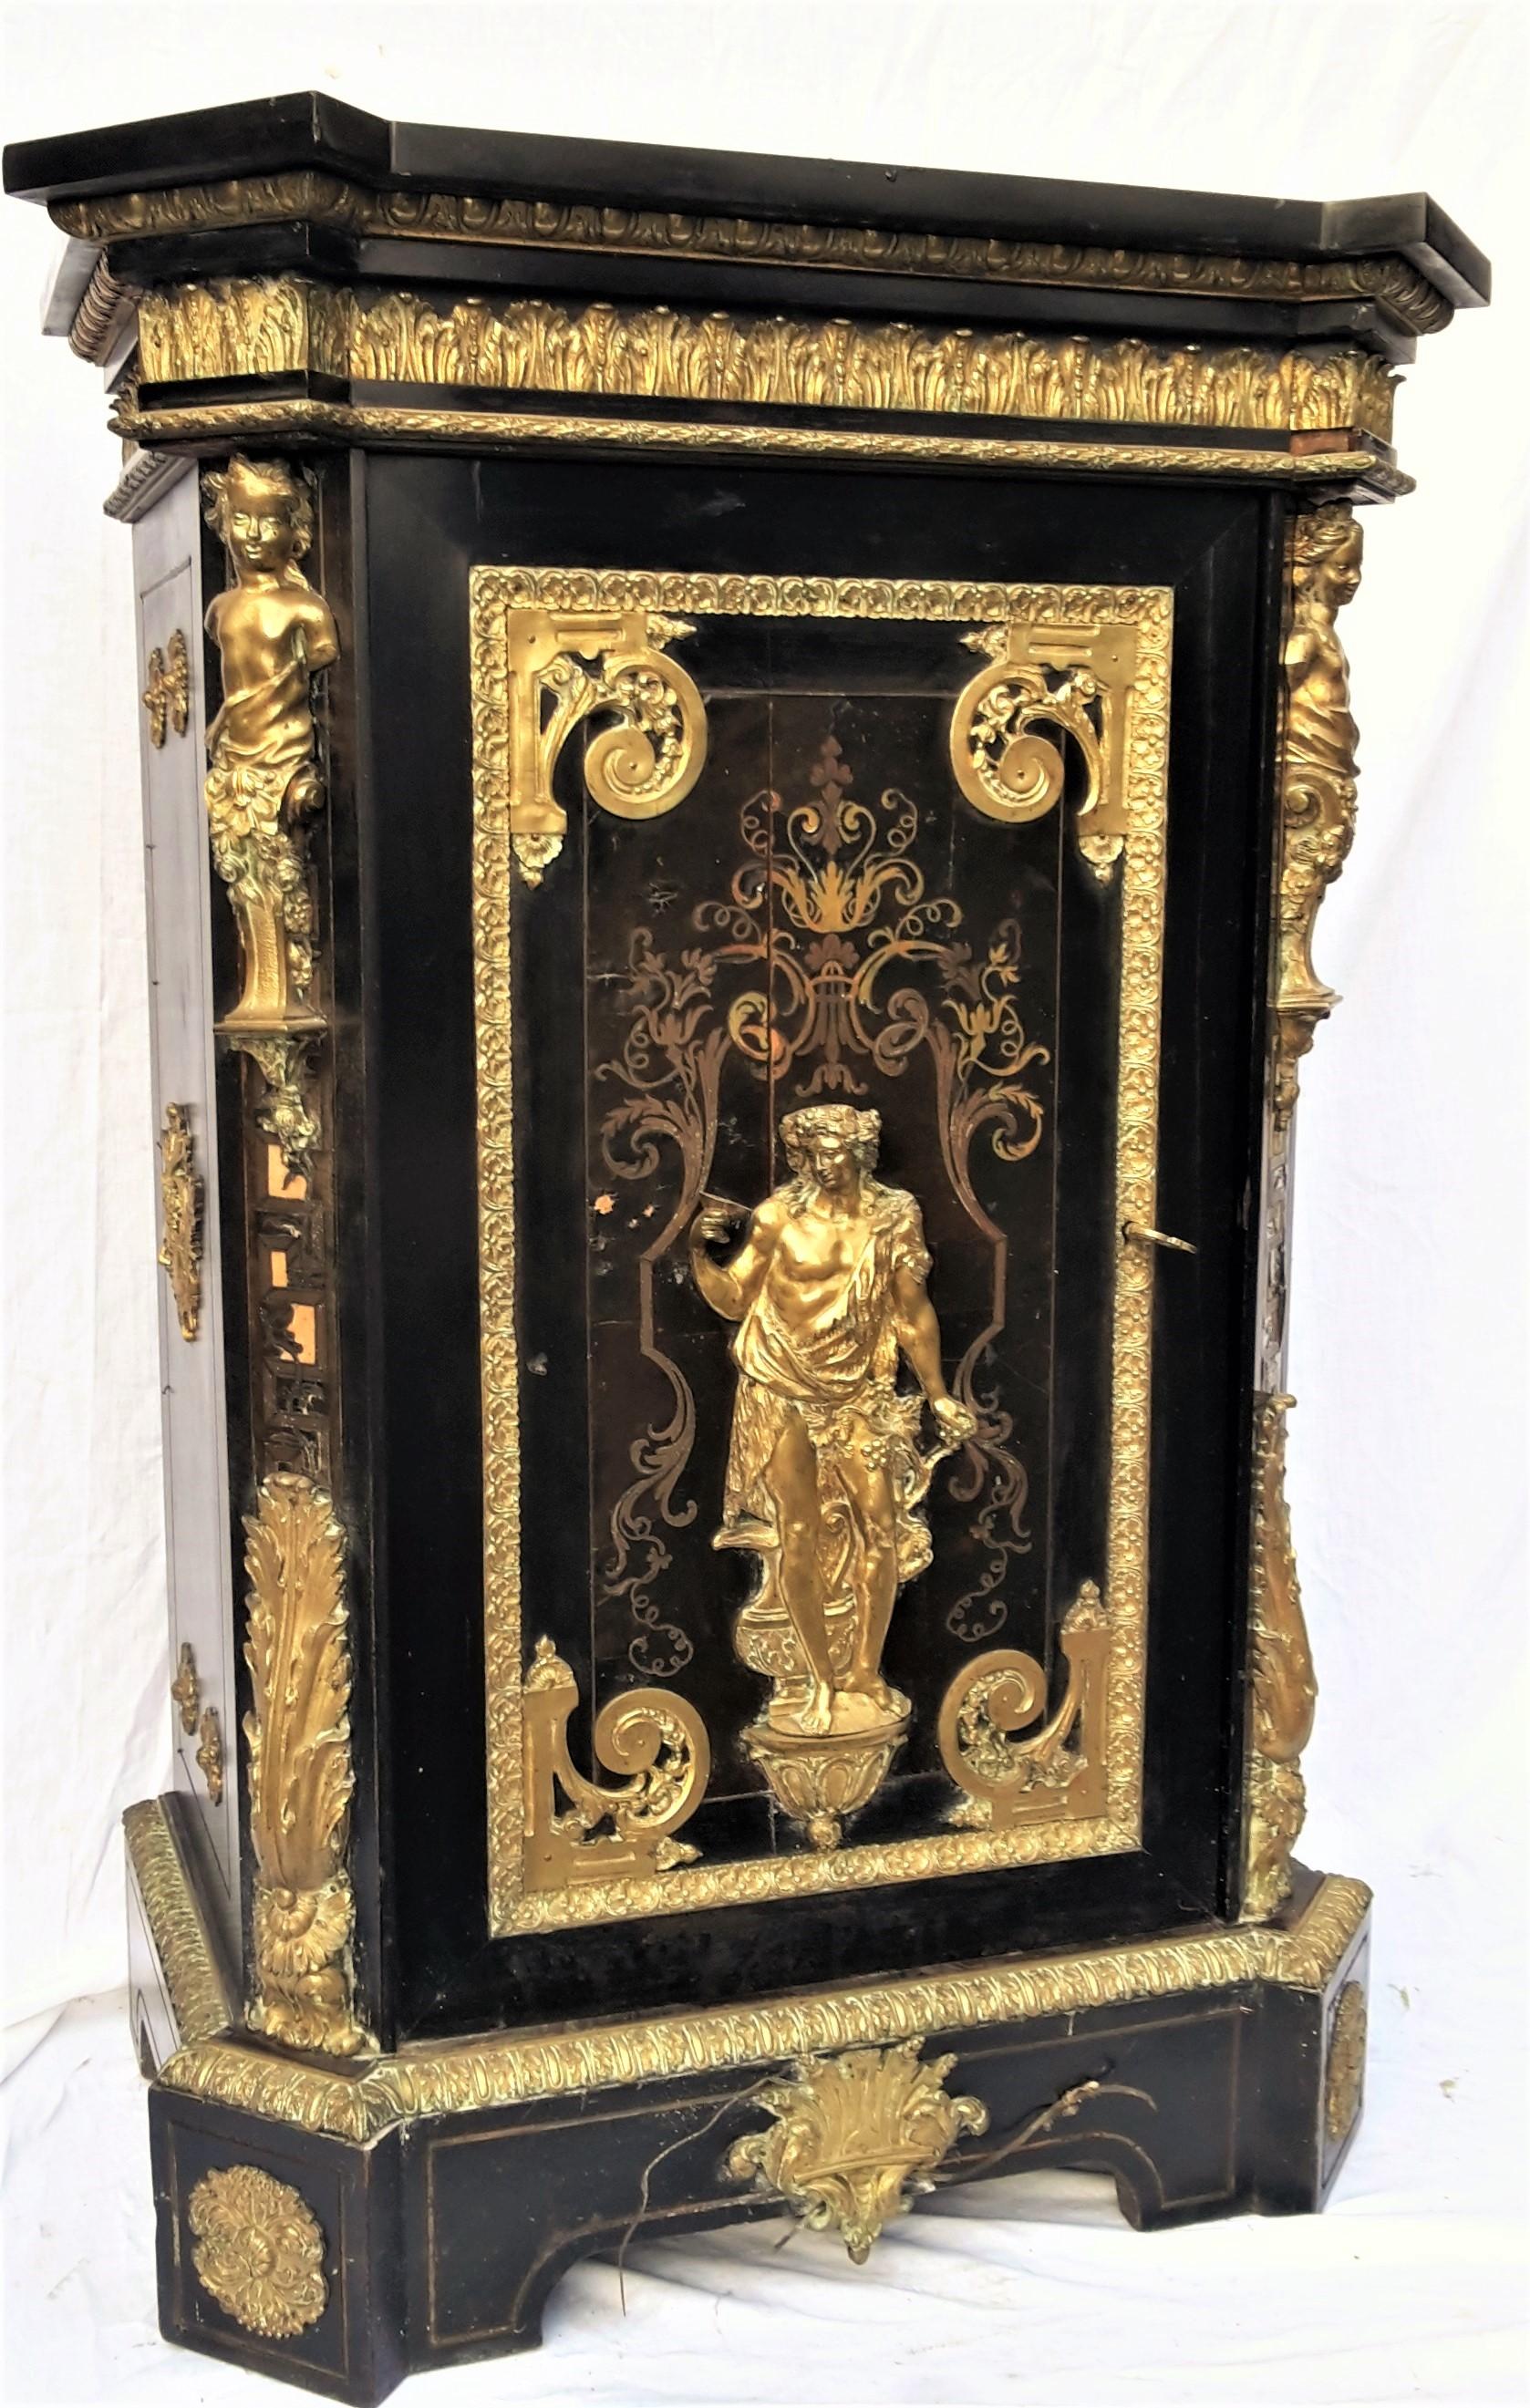 B240 rare meuble louis xiv napoleon iii befort jeune for Meuble louis xiv